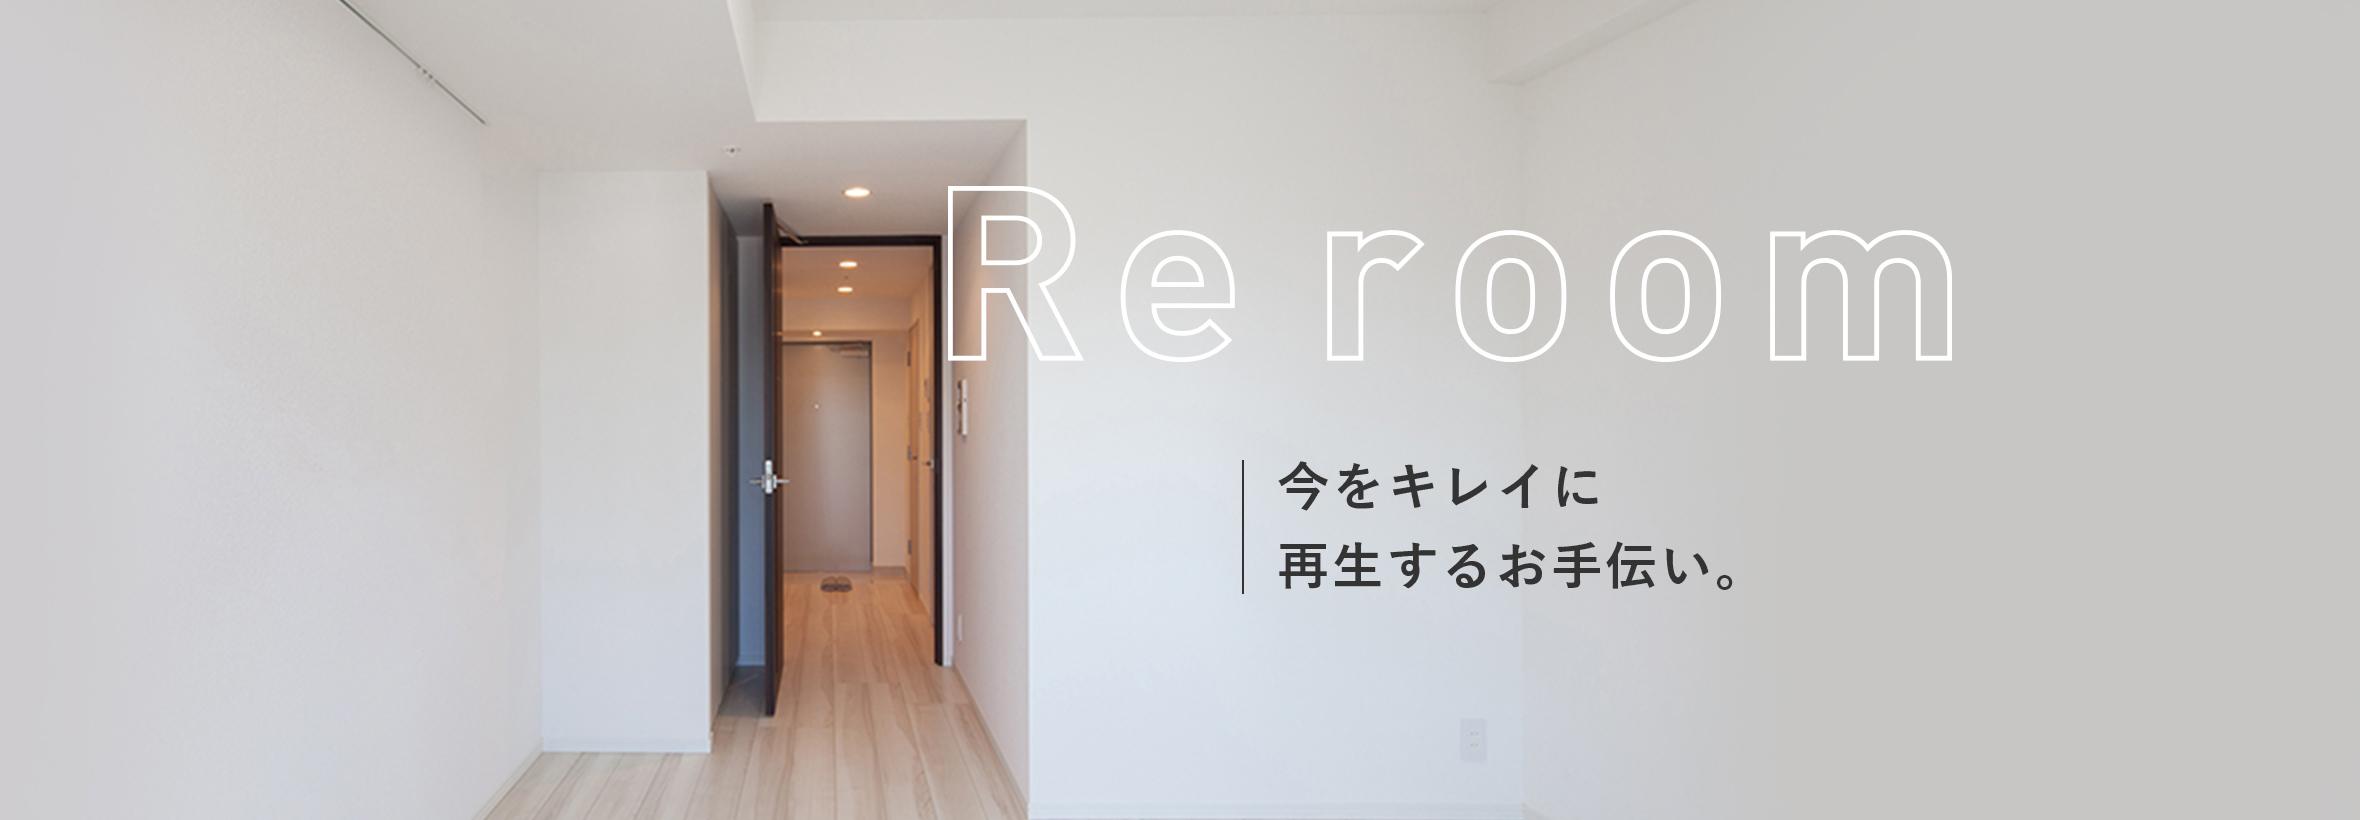 Reroom 今をキレイに再生するお手伝い。